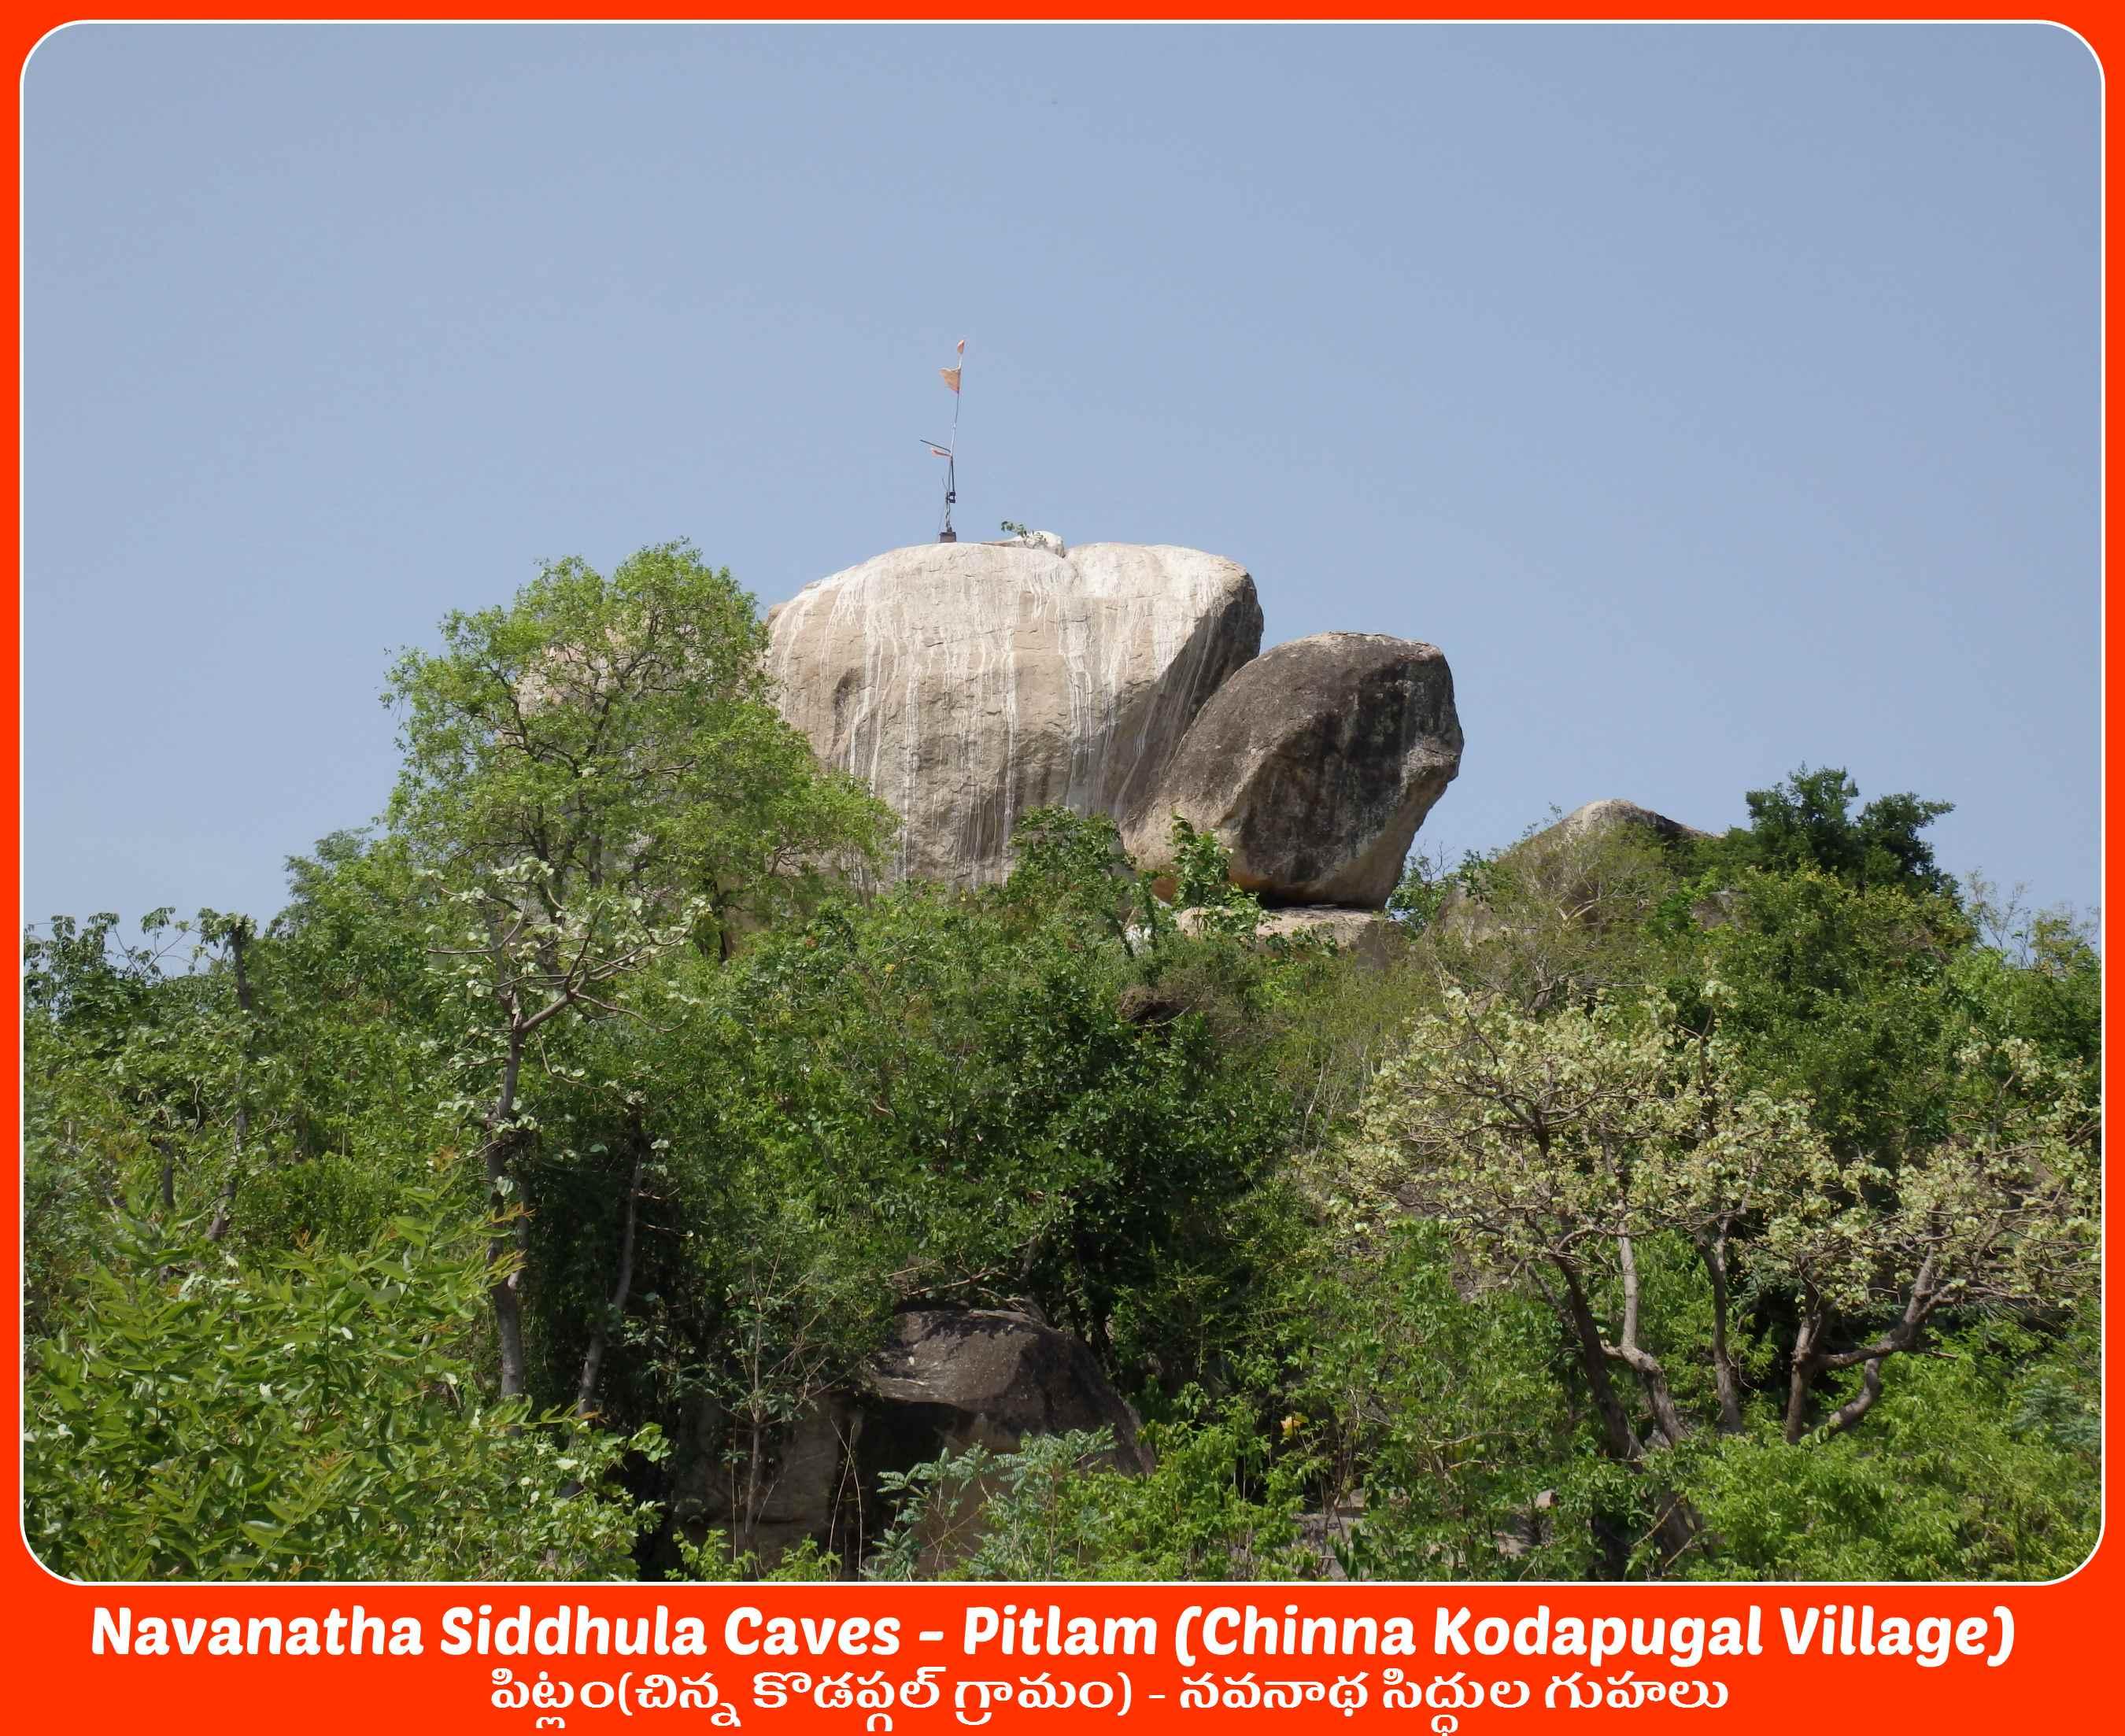 China Kodalgal (Pitlam) Navanatha Siddha Caves-3